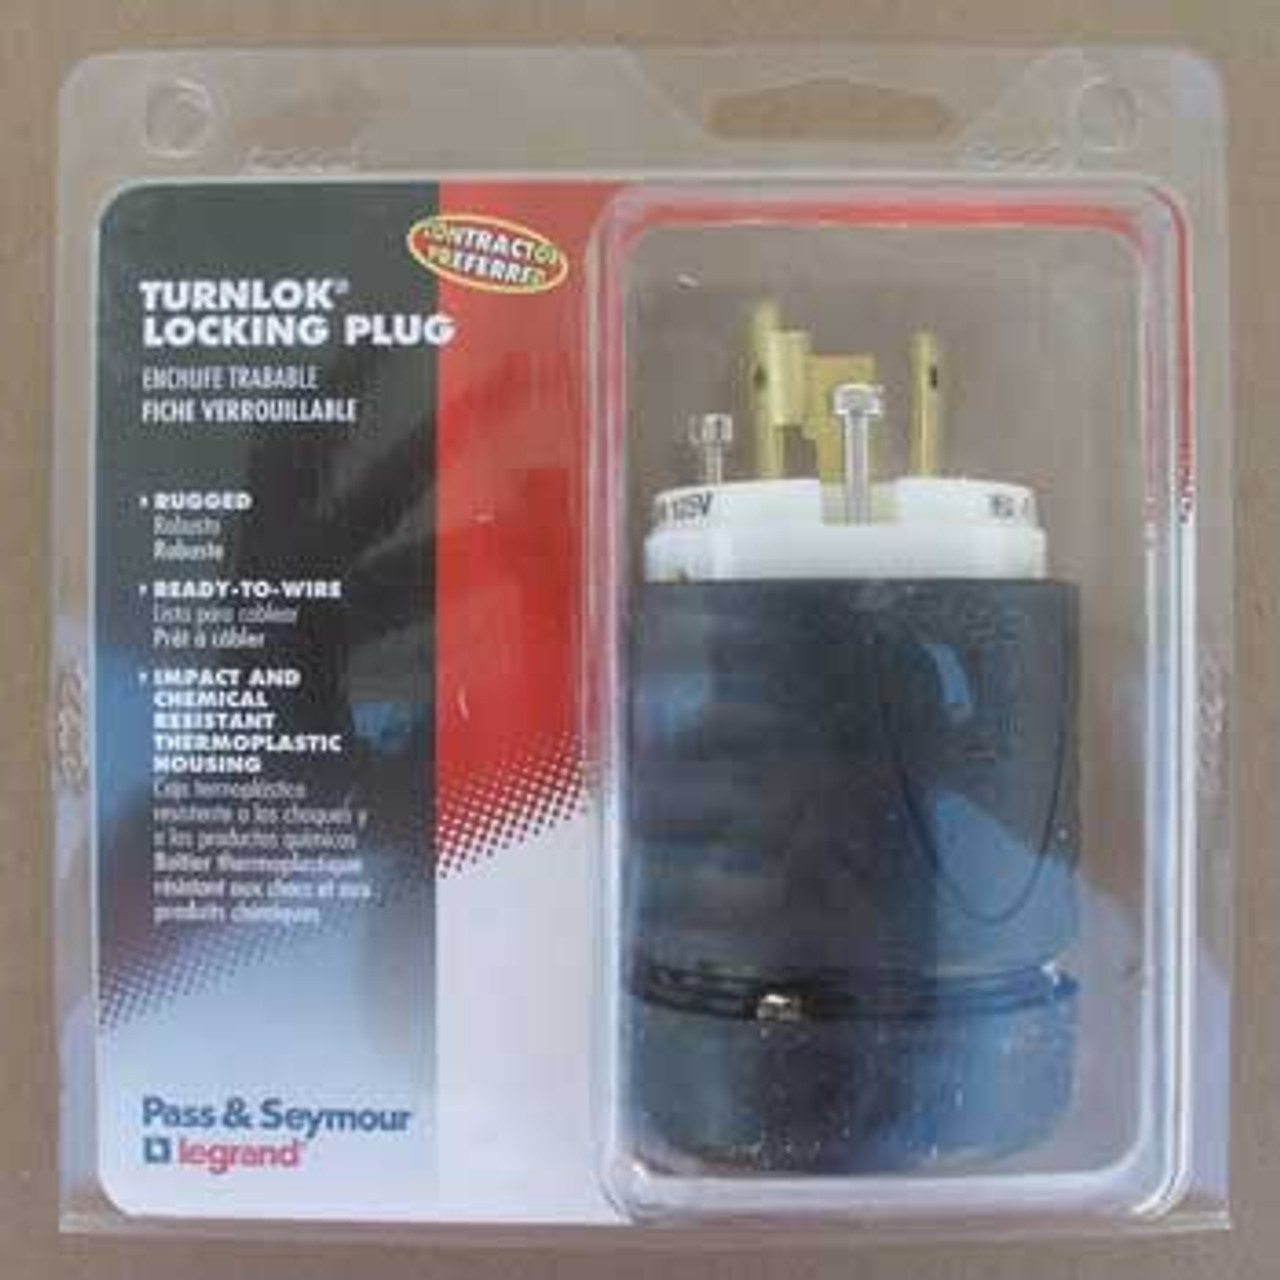 Pass & Seymour L520-PCCV3 20 Amp 125 VAC Turnlok Plug